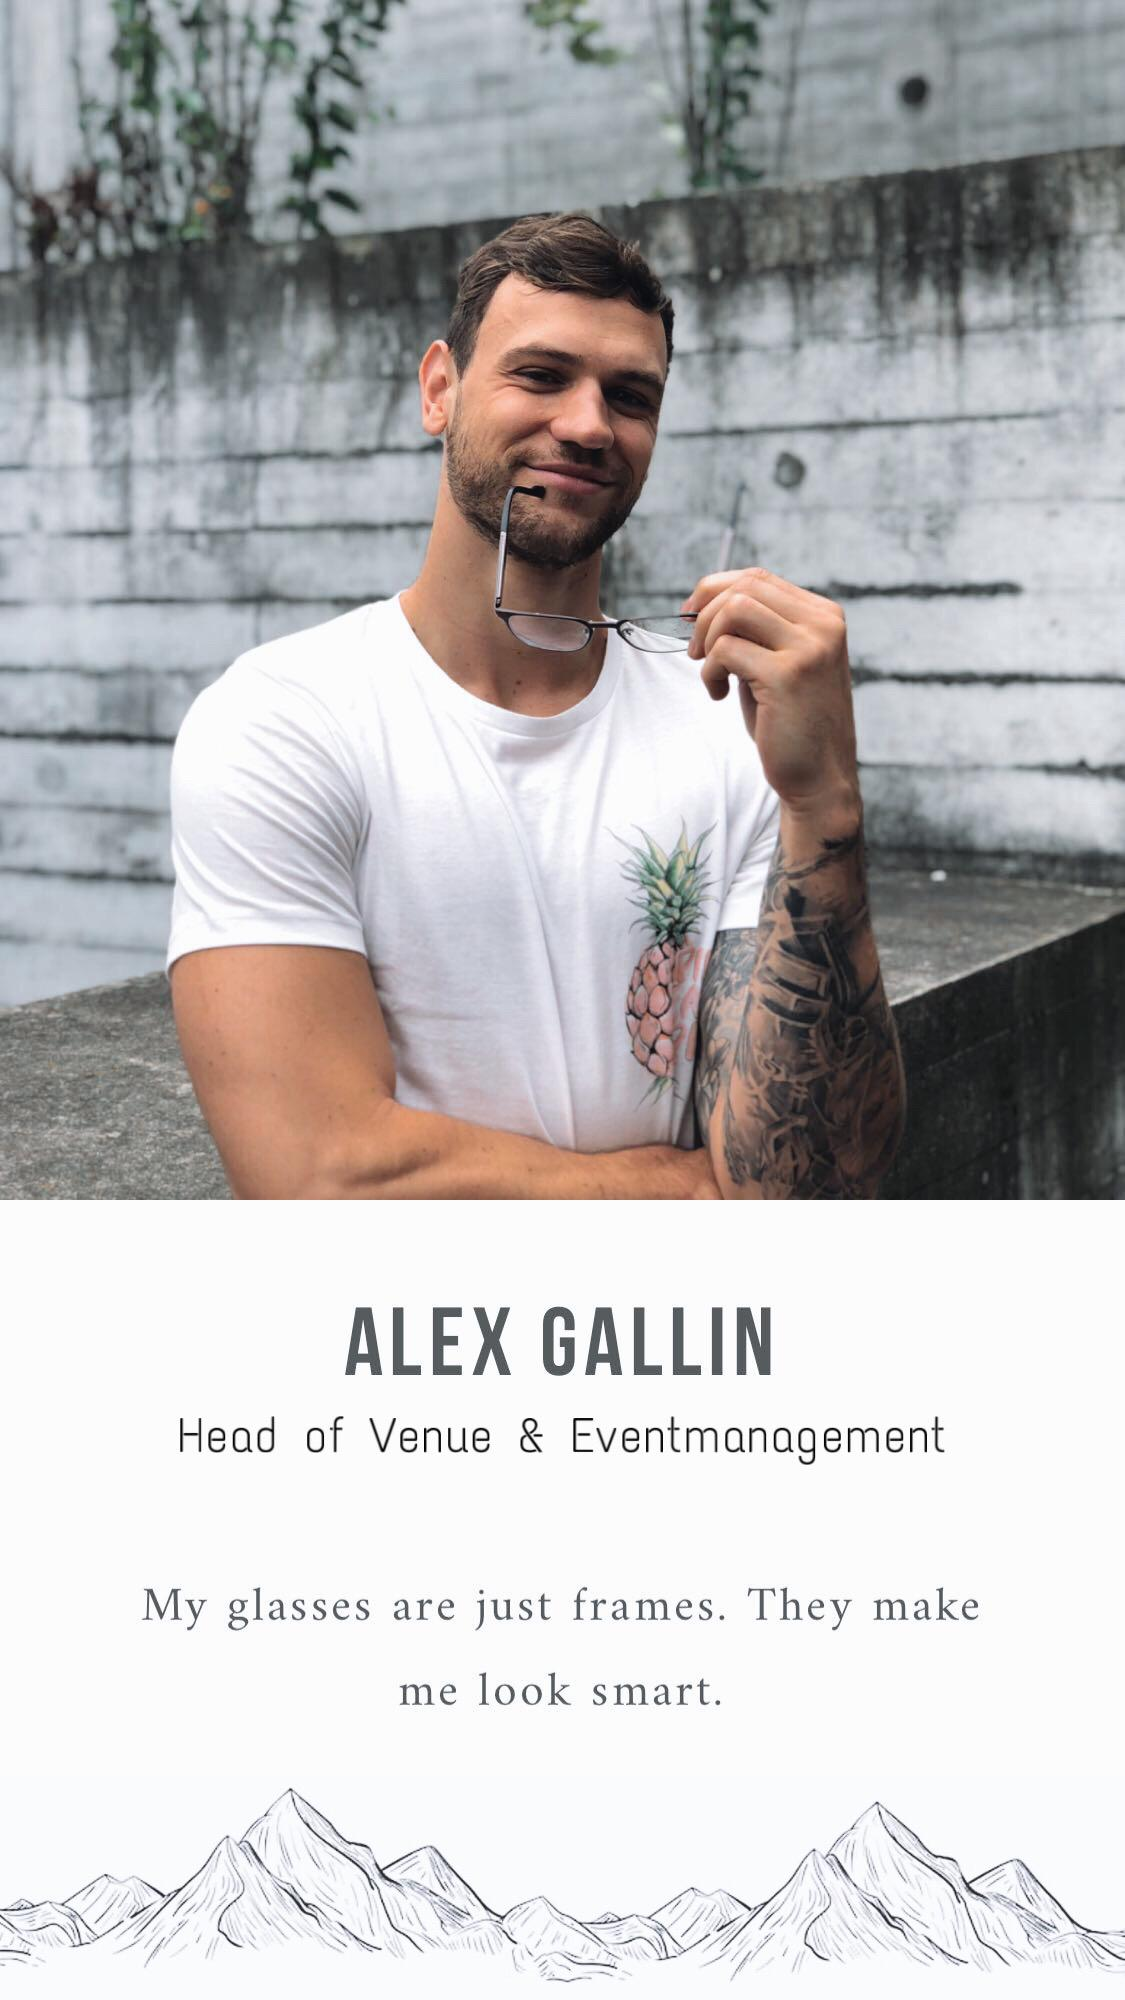 Head Venue, Alex Gallin.jpg